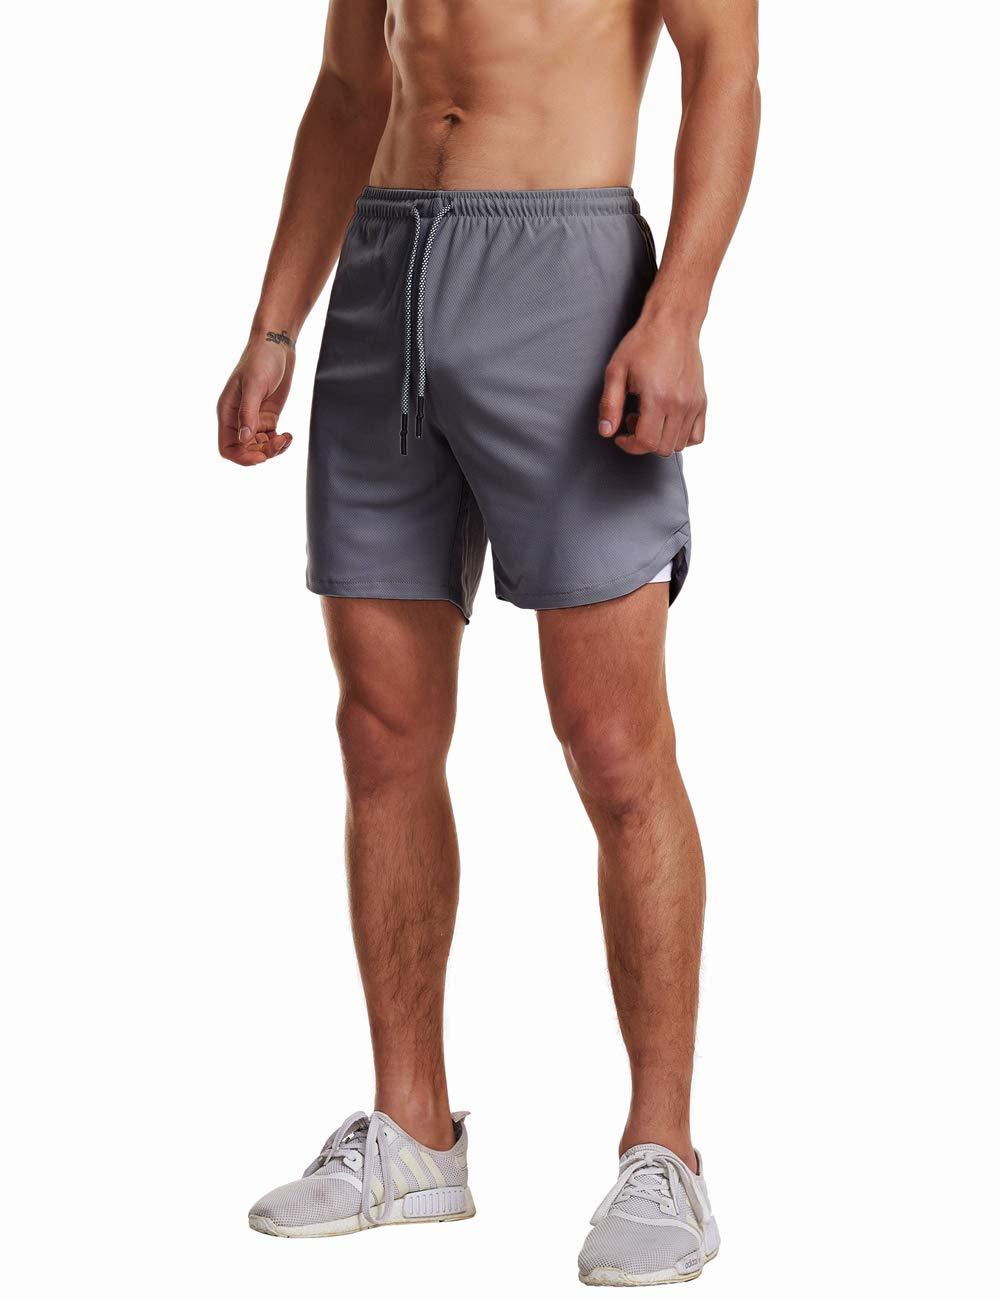 FLYFIREFLY Mens 2-in-1 Workout Running Shorts 7 Lightweight Gym Yoga Training Sport Short Pants